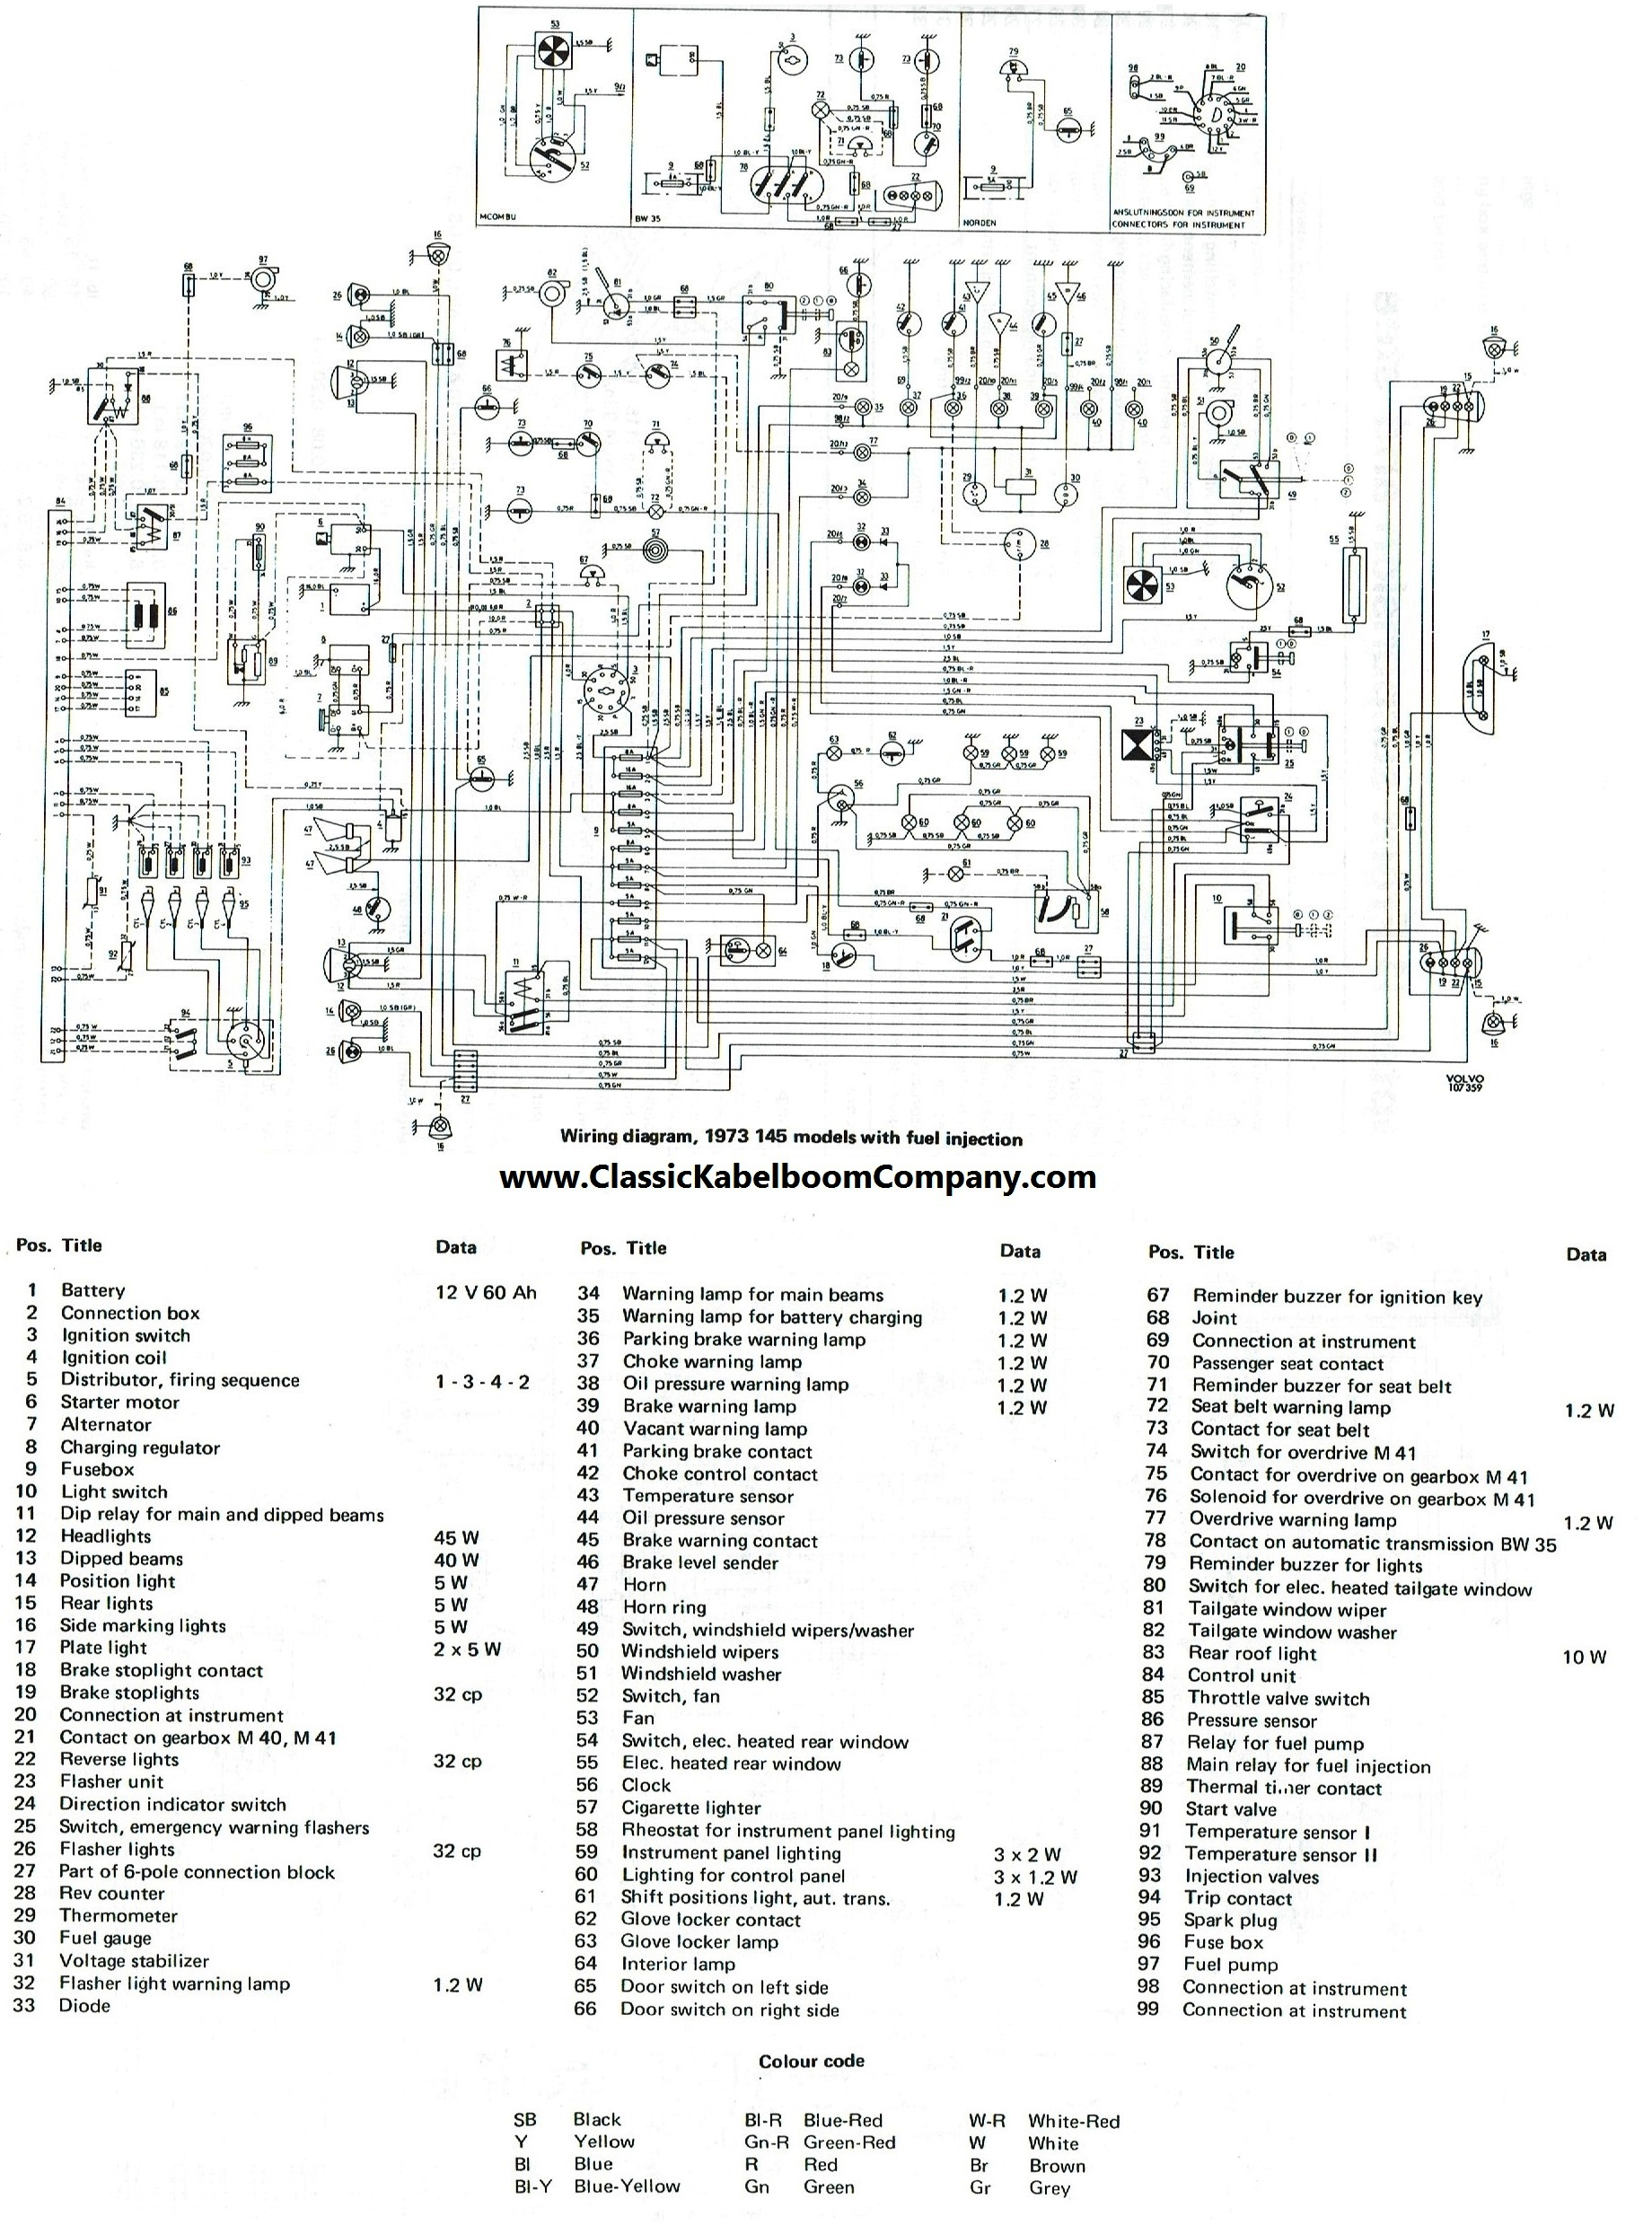 vol22?cdp=a classic kabelboom company elektrisch bedrading schema volvo 1973 Volvo 142 at reclaimingppi.co